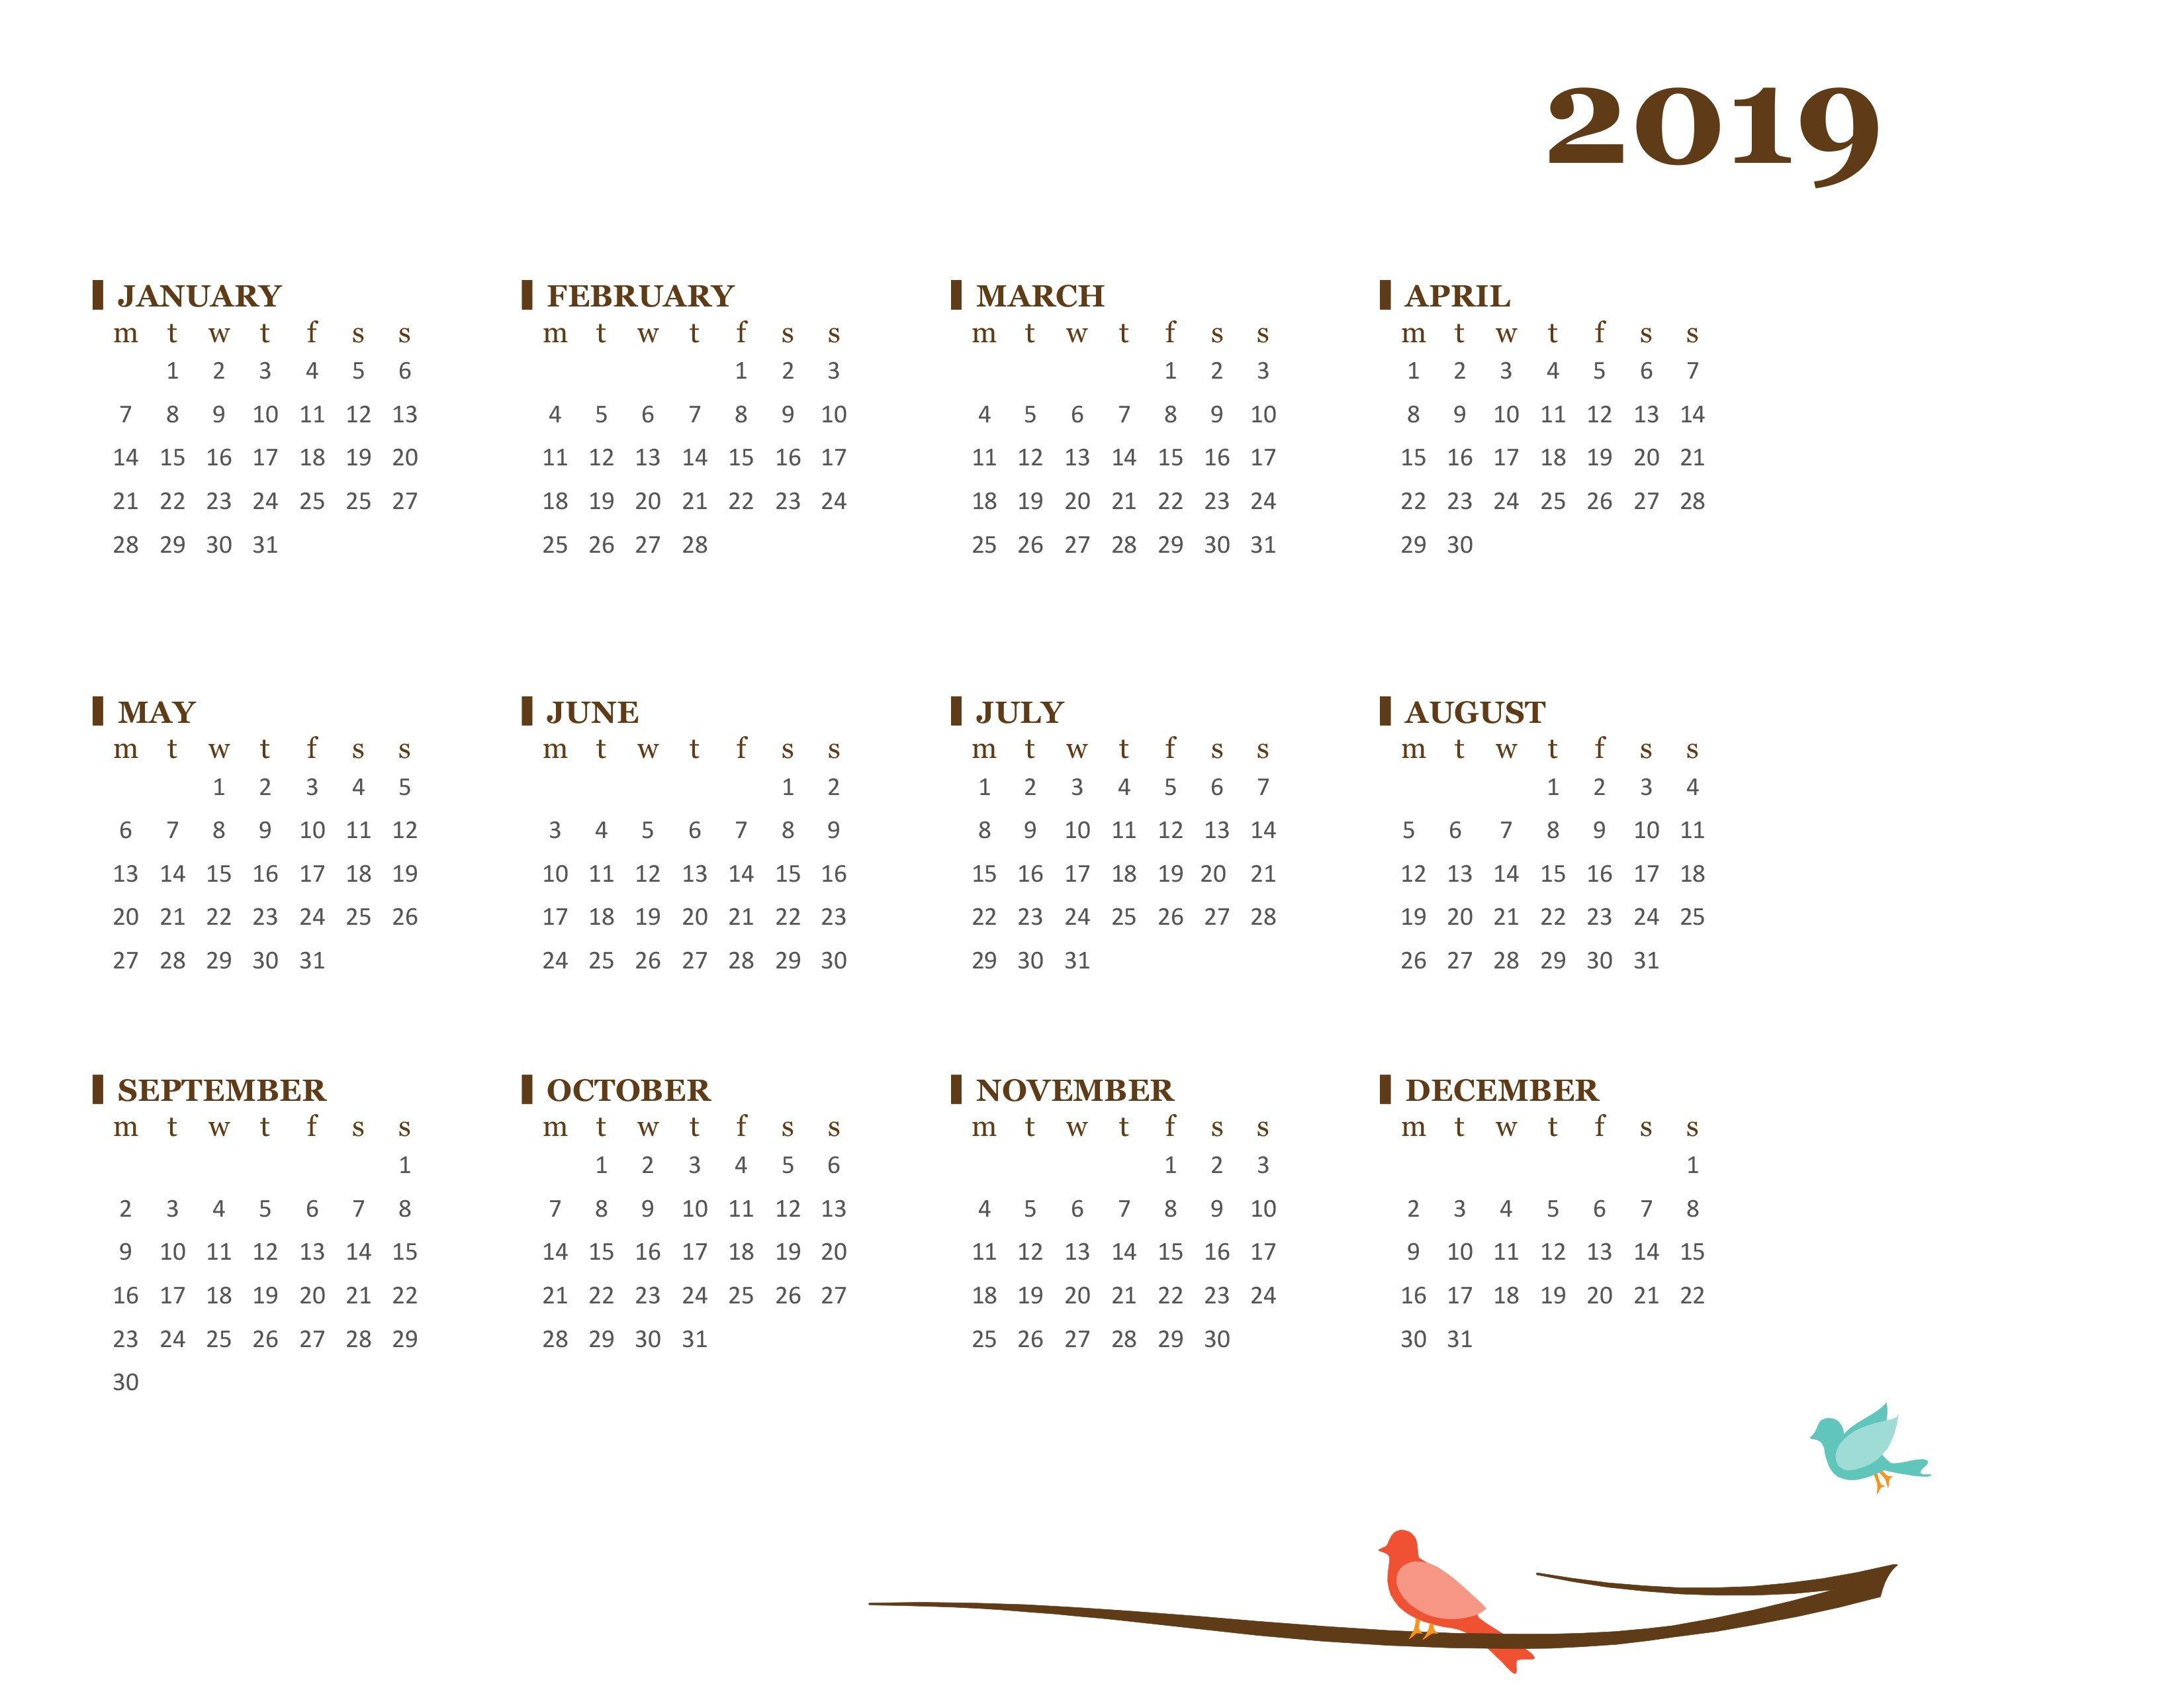 2019 Yearly Calendar (Mon Sun) Calendar E N 2019